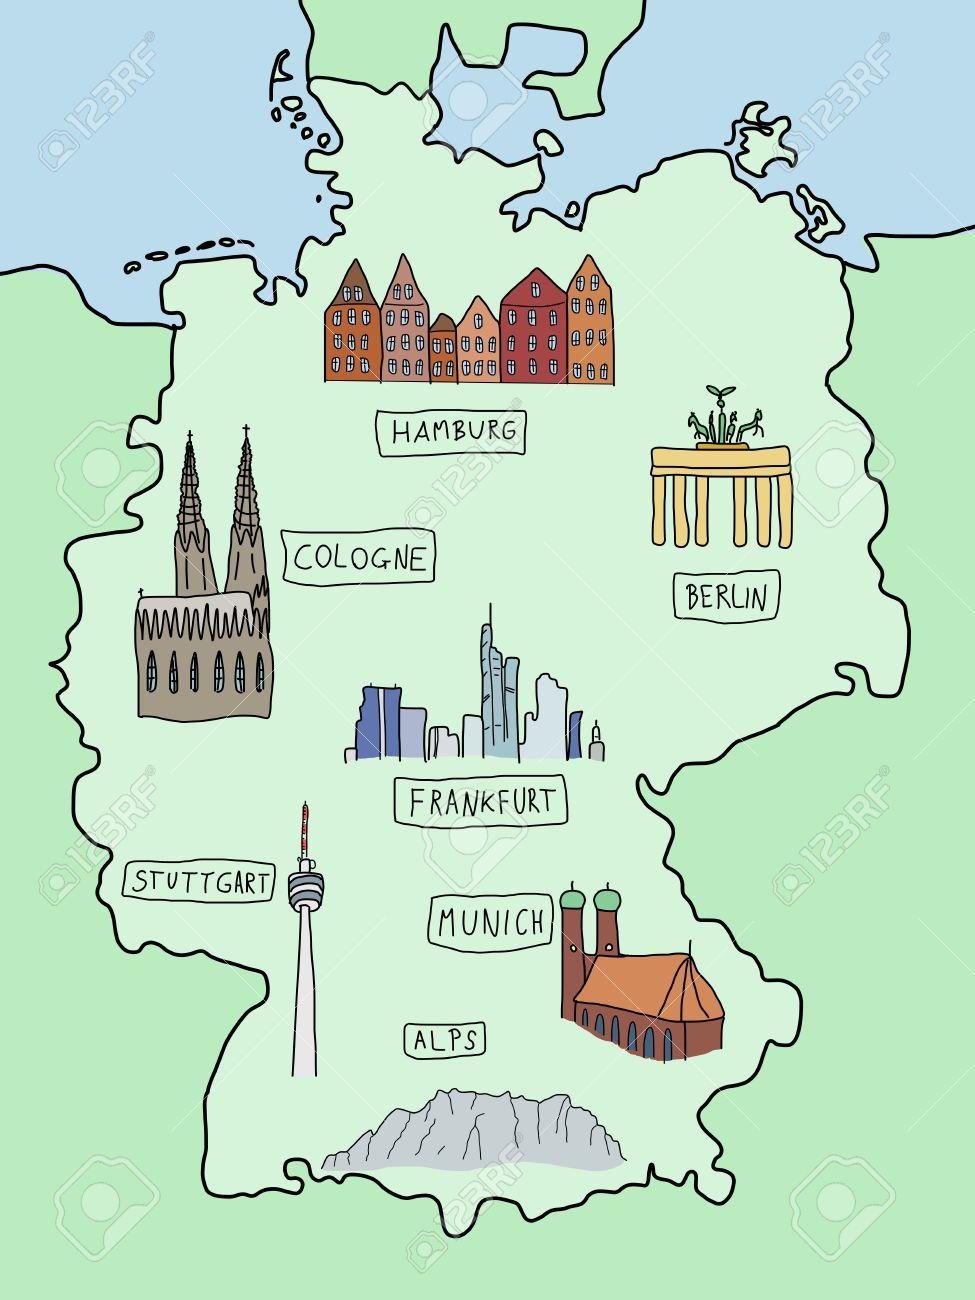 Köln Karte Deutschland.Stock Photo